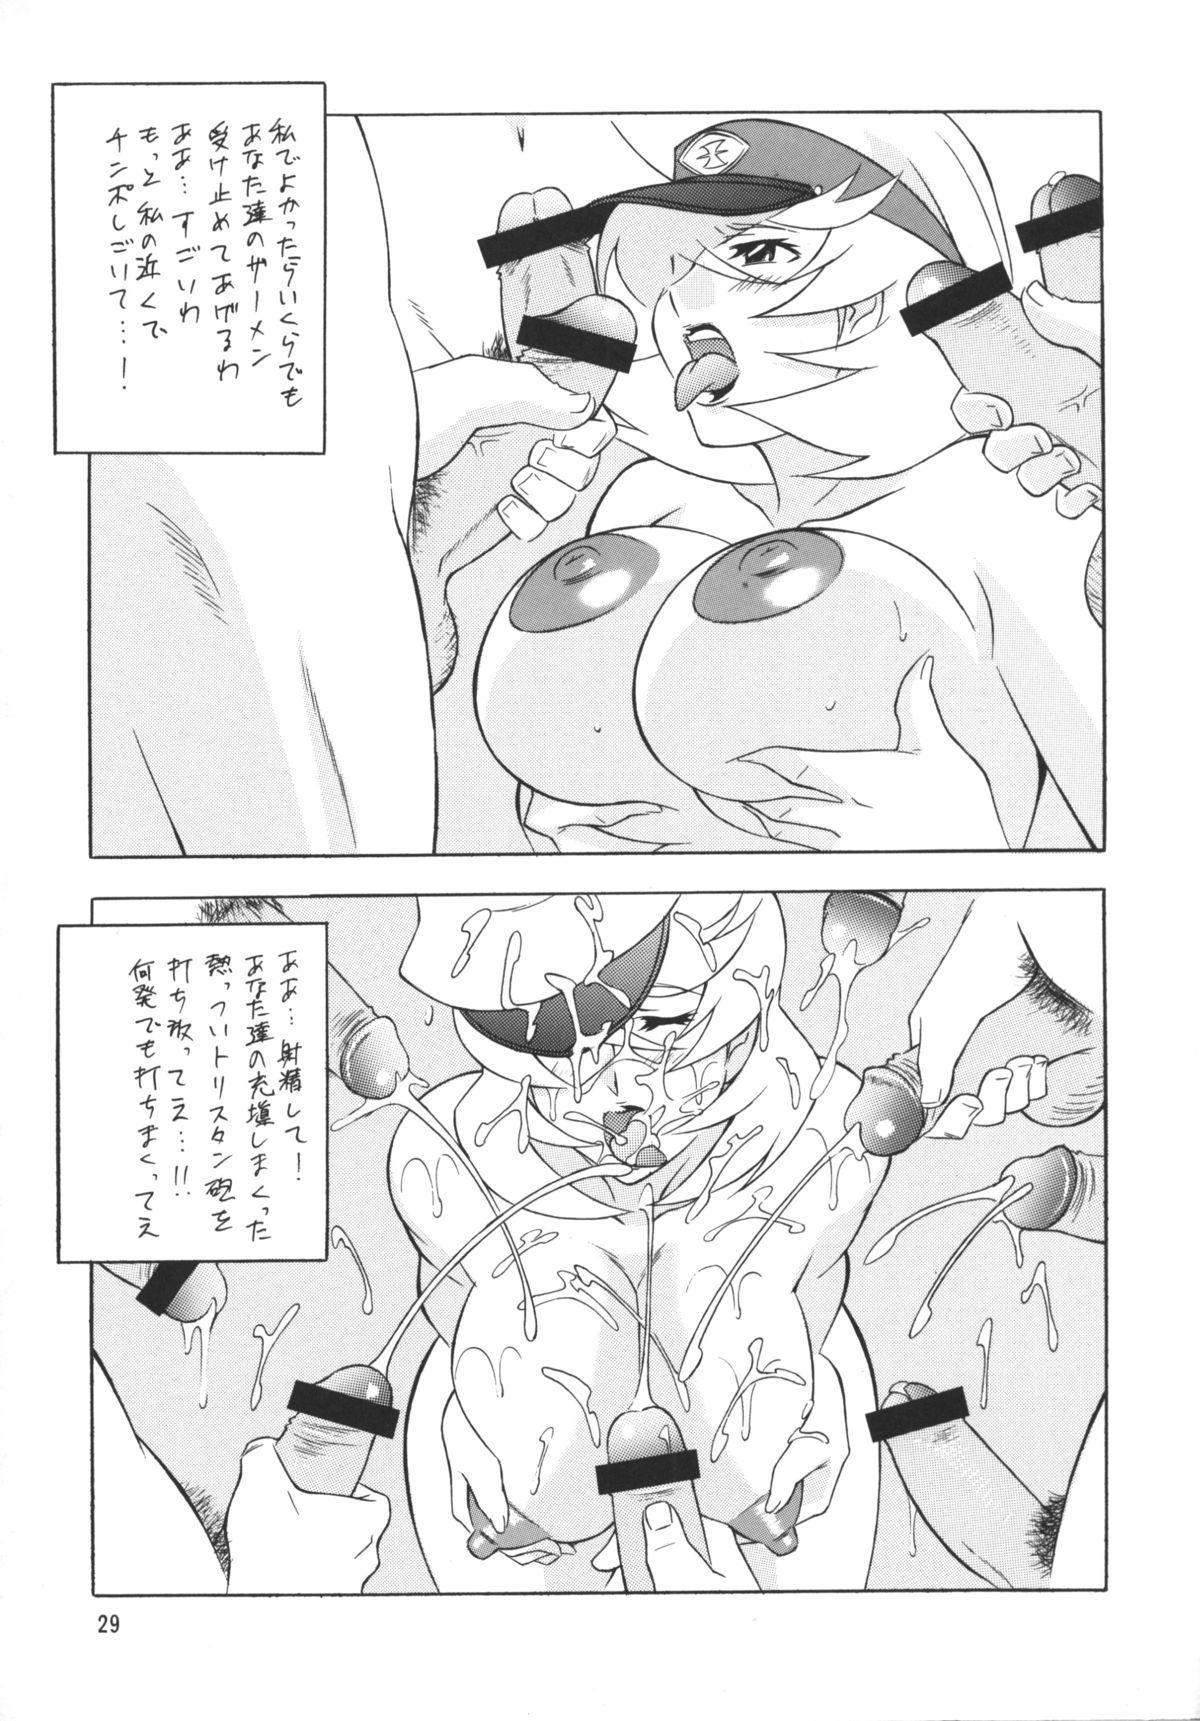 [Okachimentaiko (H-H, Minazuki Akira) Oh! Hentai (Various) 27